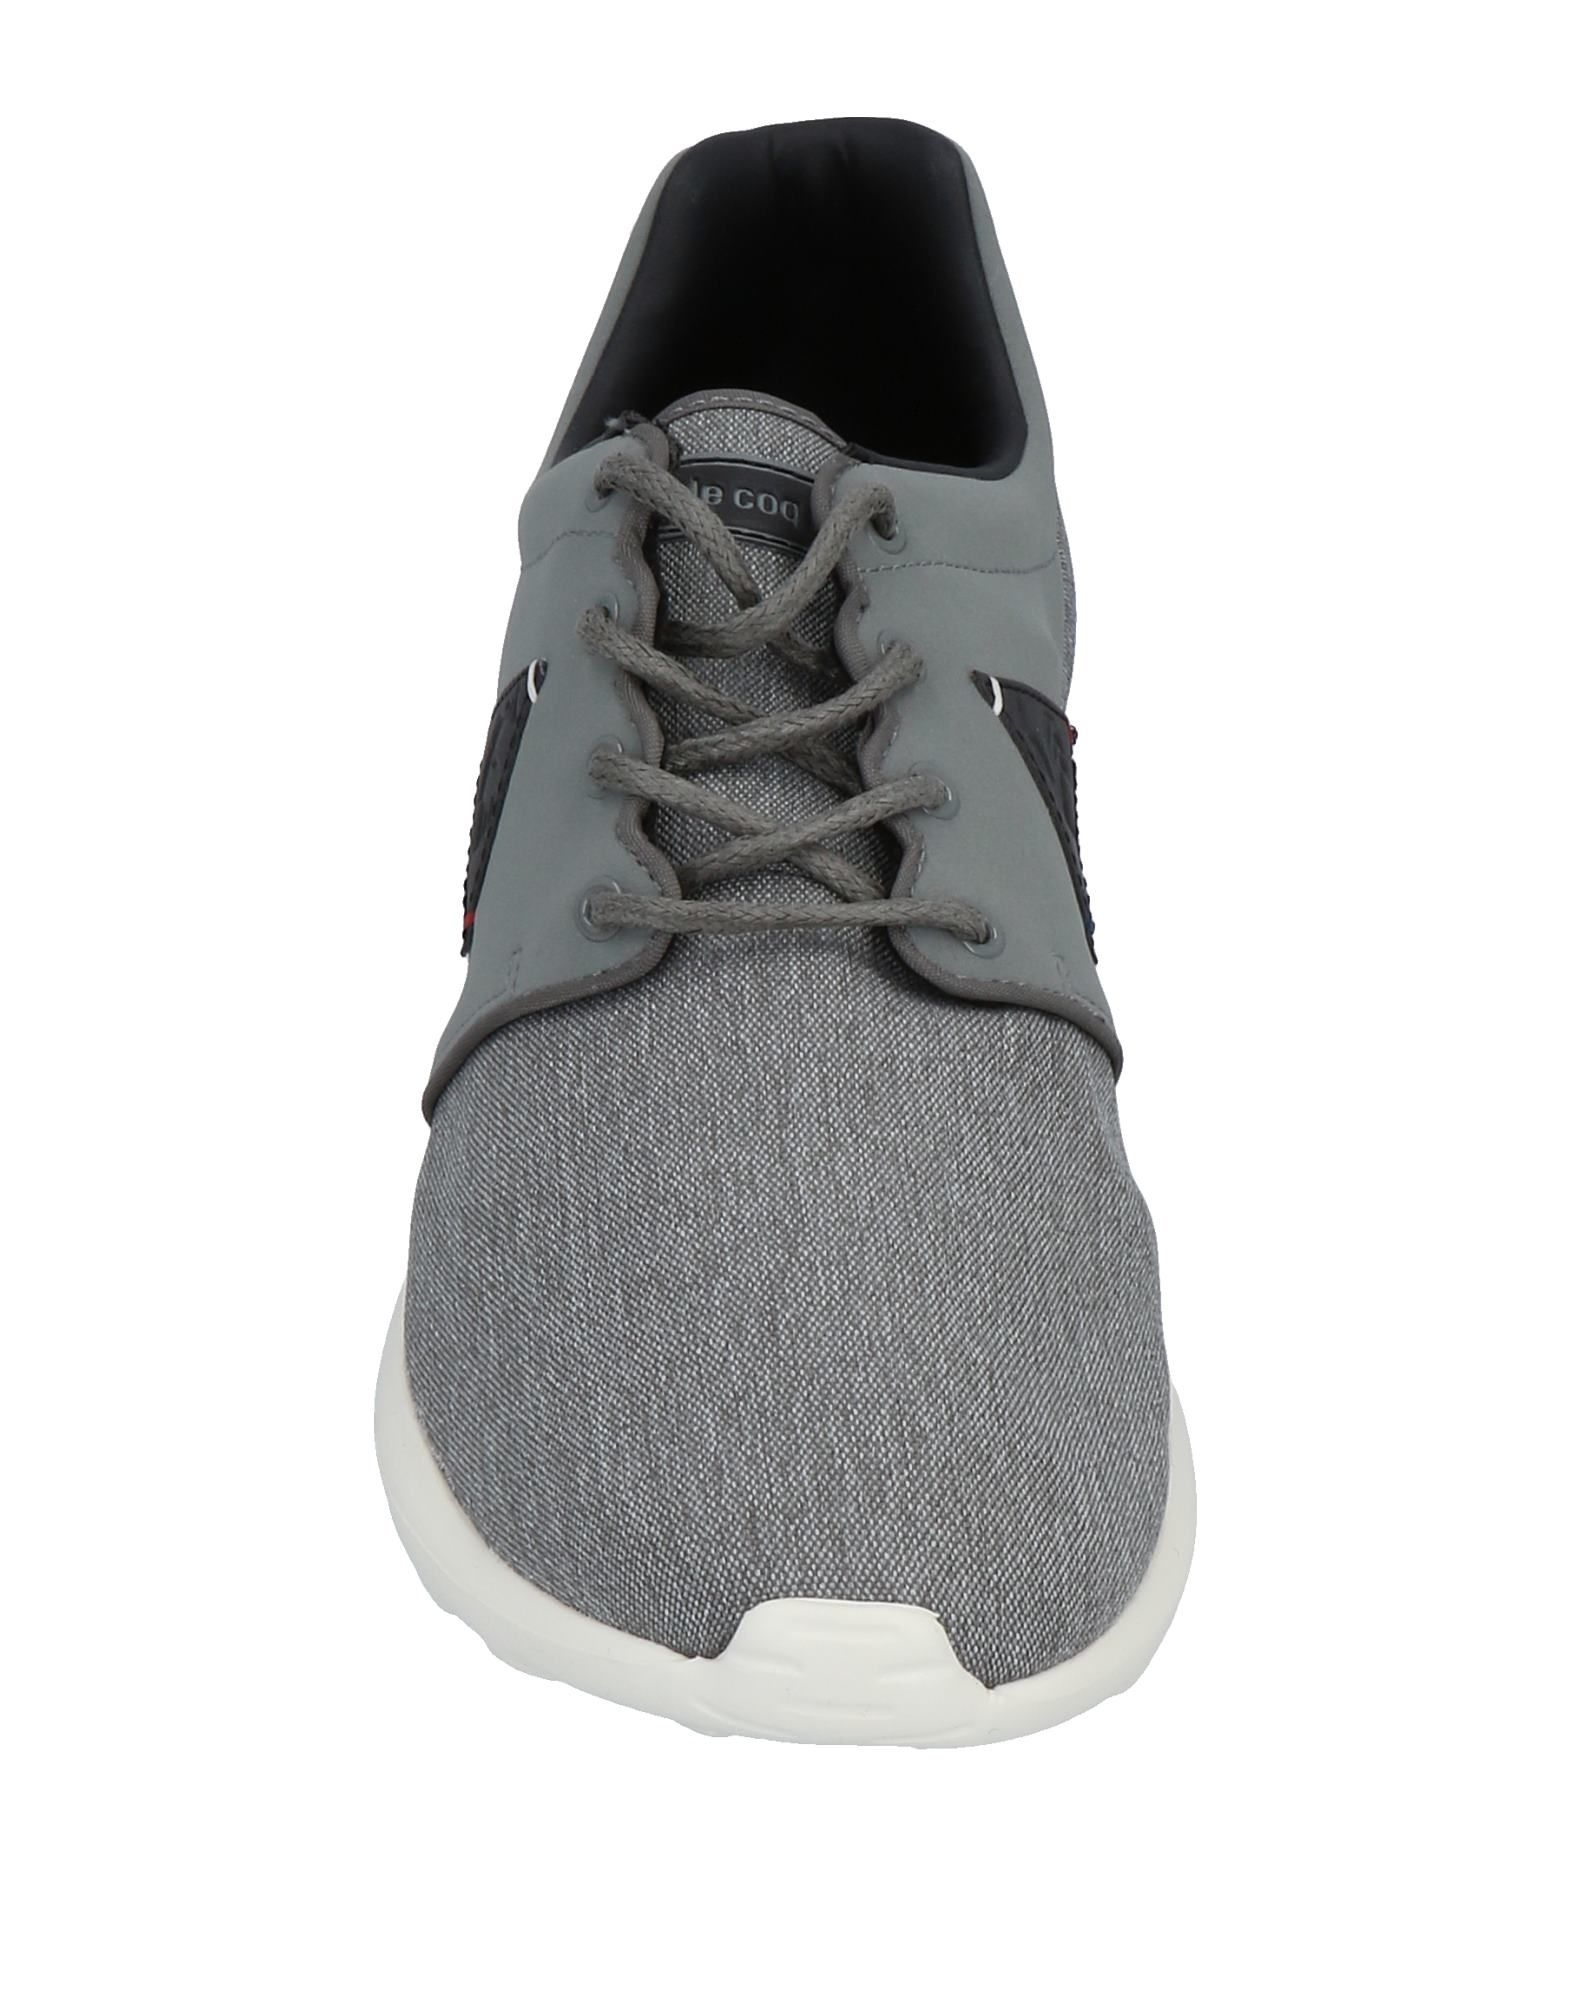 Le Coq Le Sportif Sneakers - Men Le Coq Coq Sportif Sneakers online on  Canada - 11497410WN a530a9